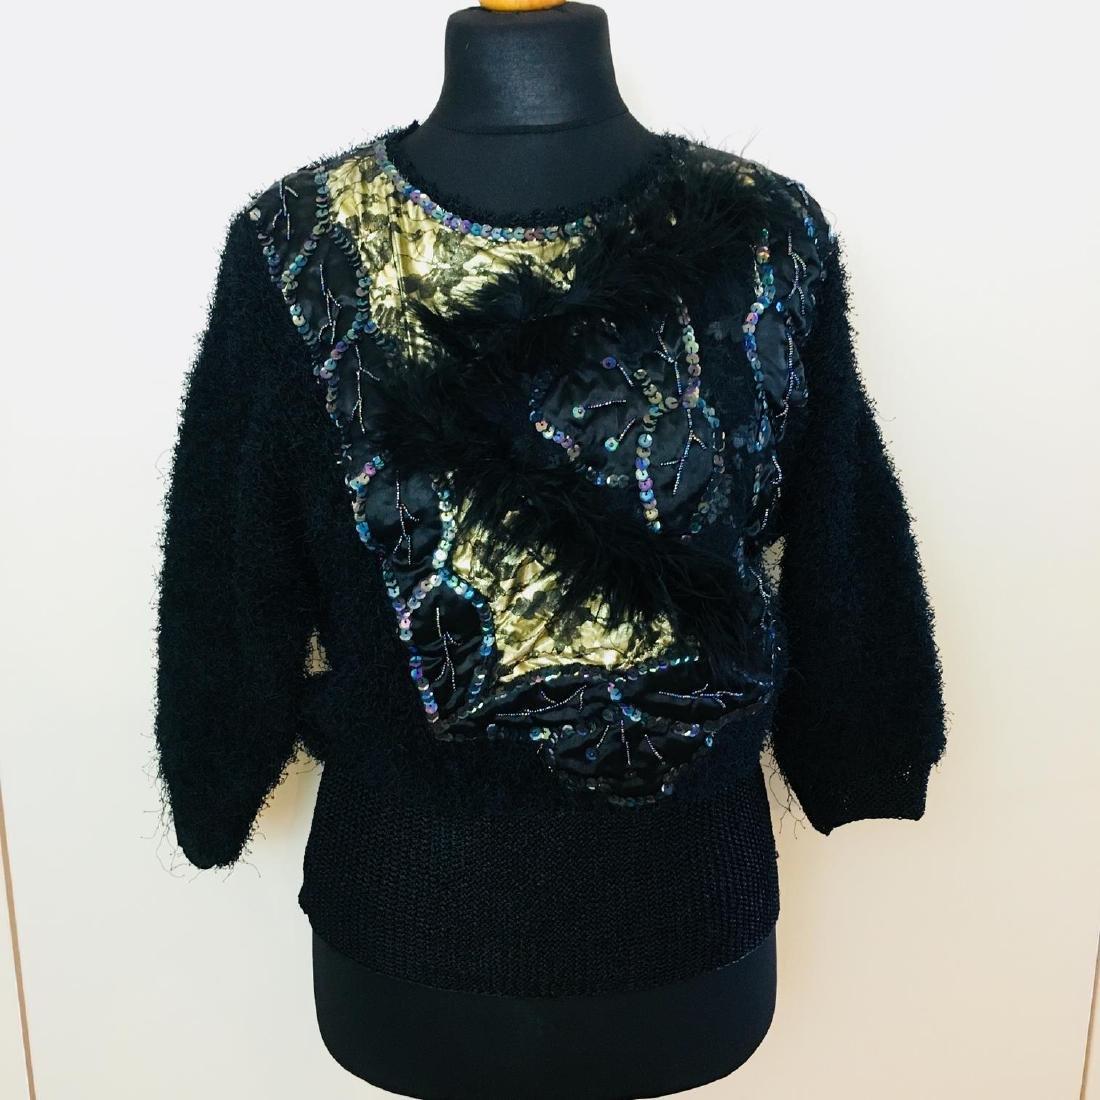 Vintage Women's Fluffy Sweater Jumper Size US 10